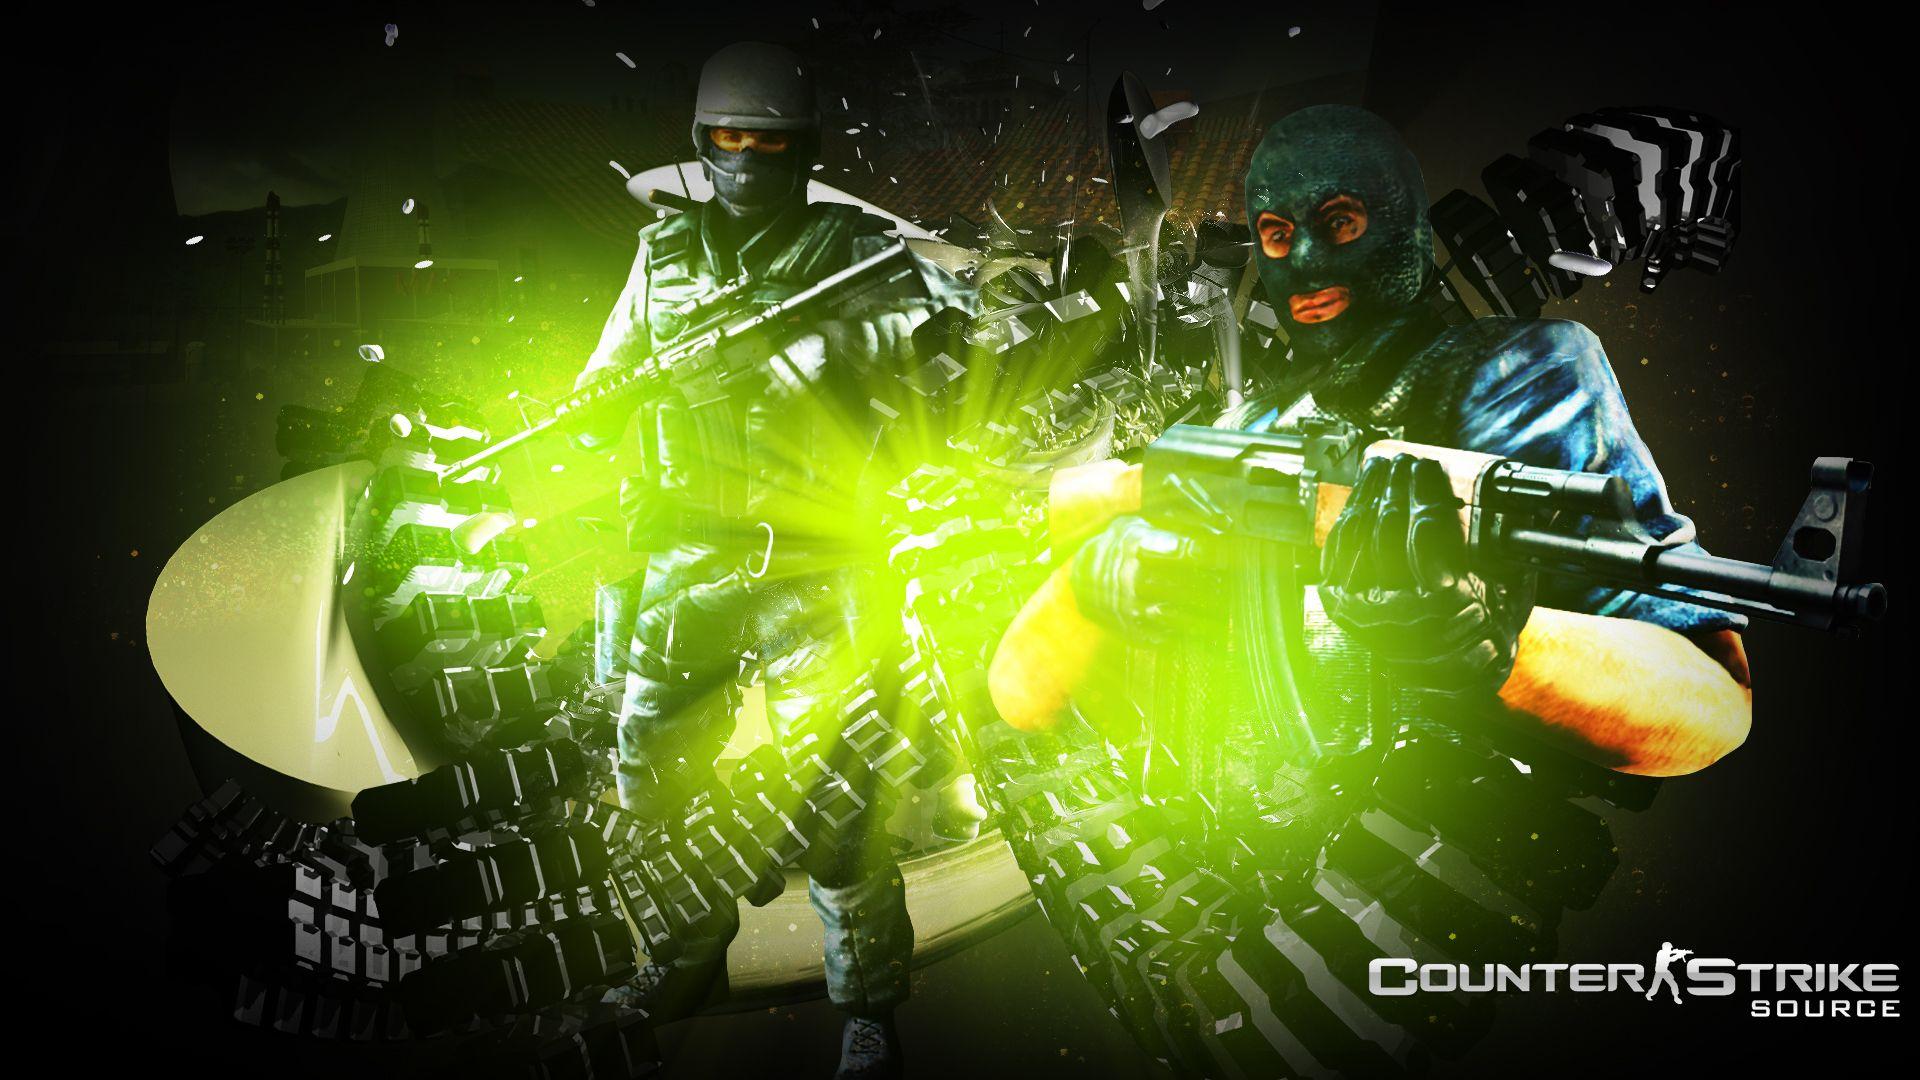 Counter-Strike: Source Free